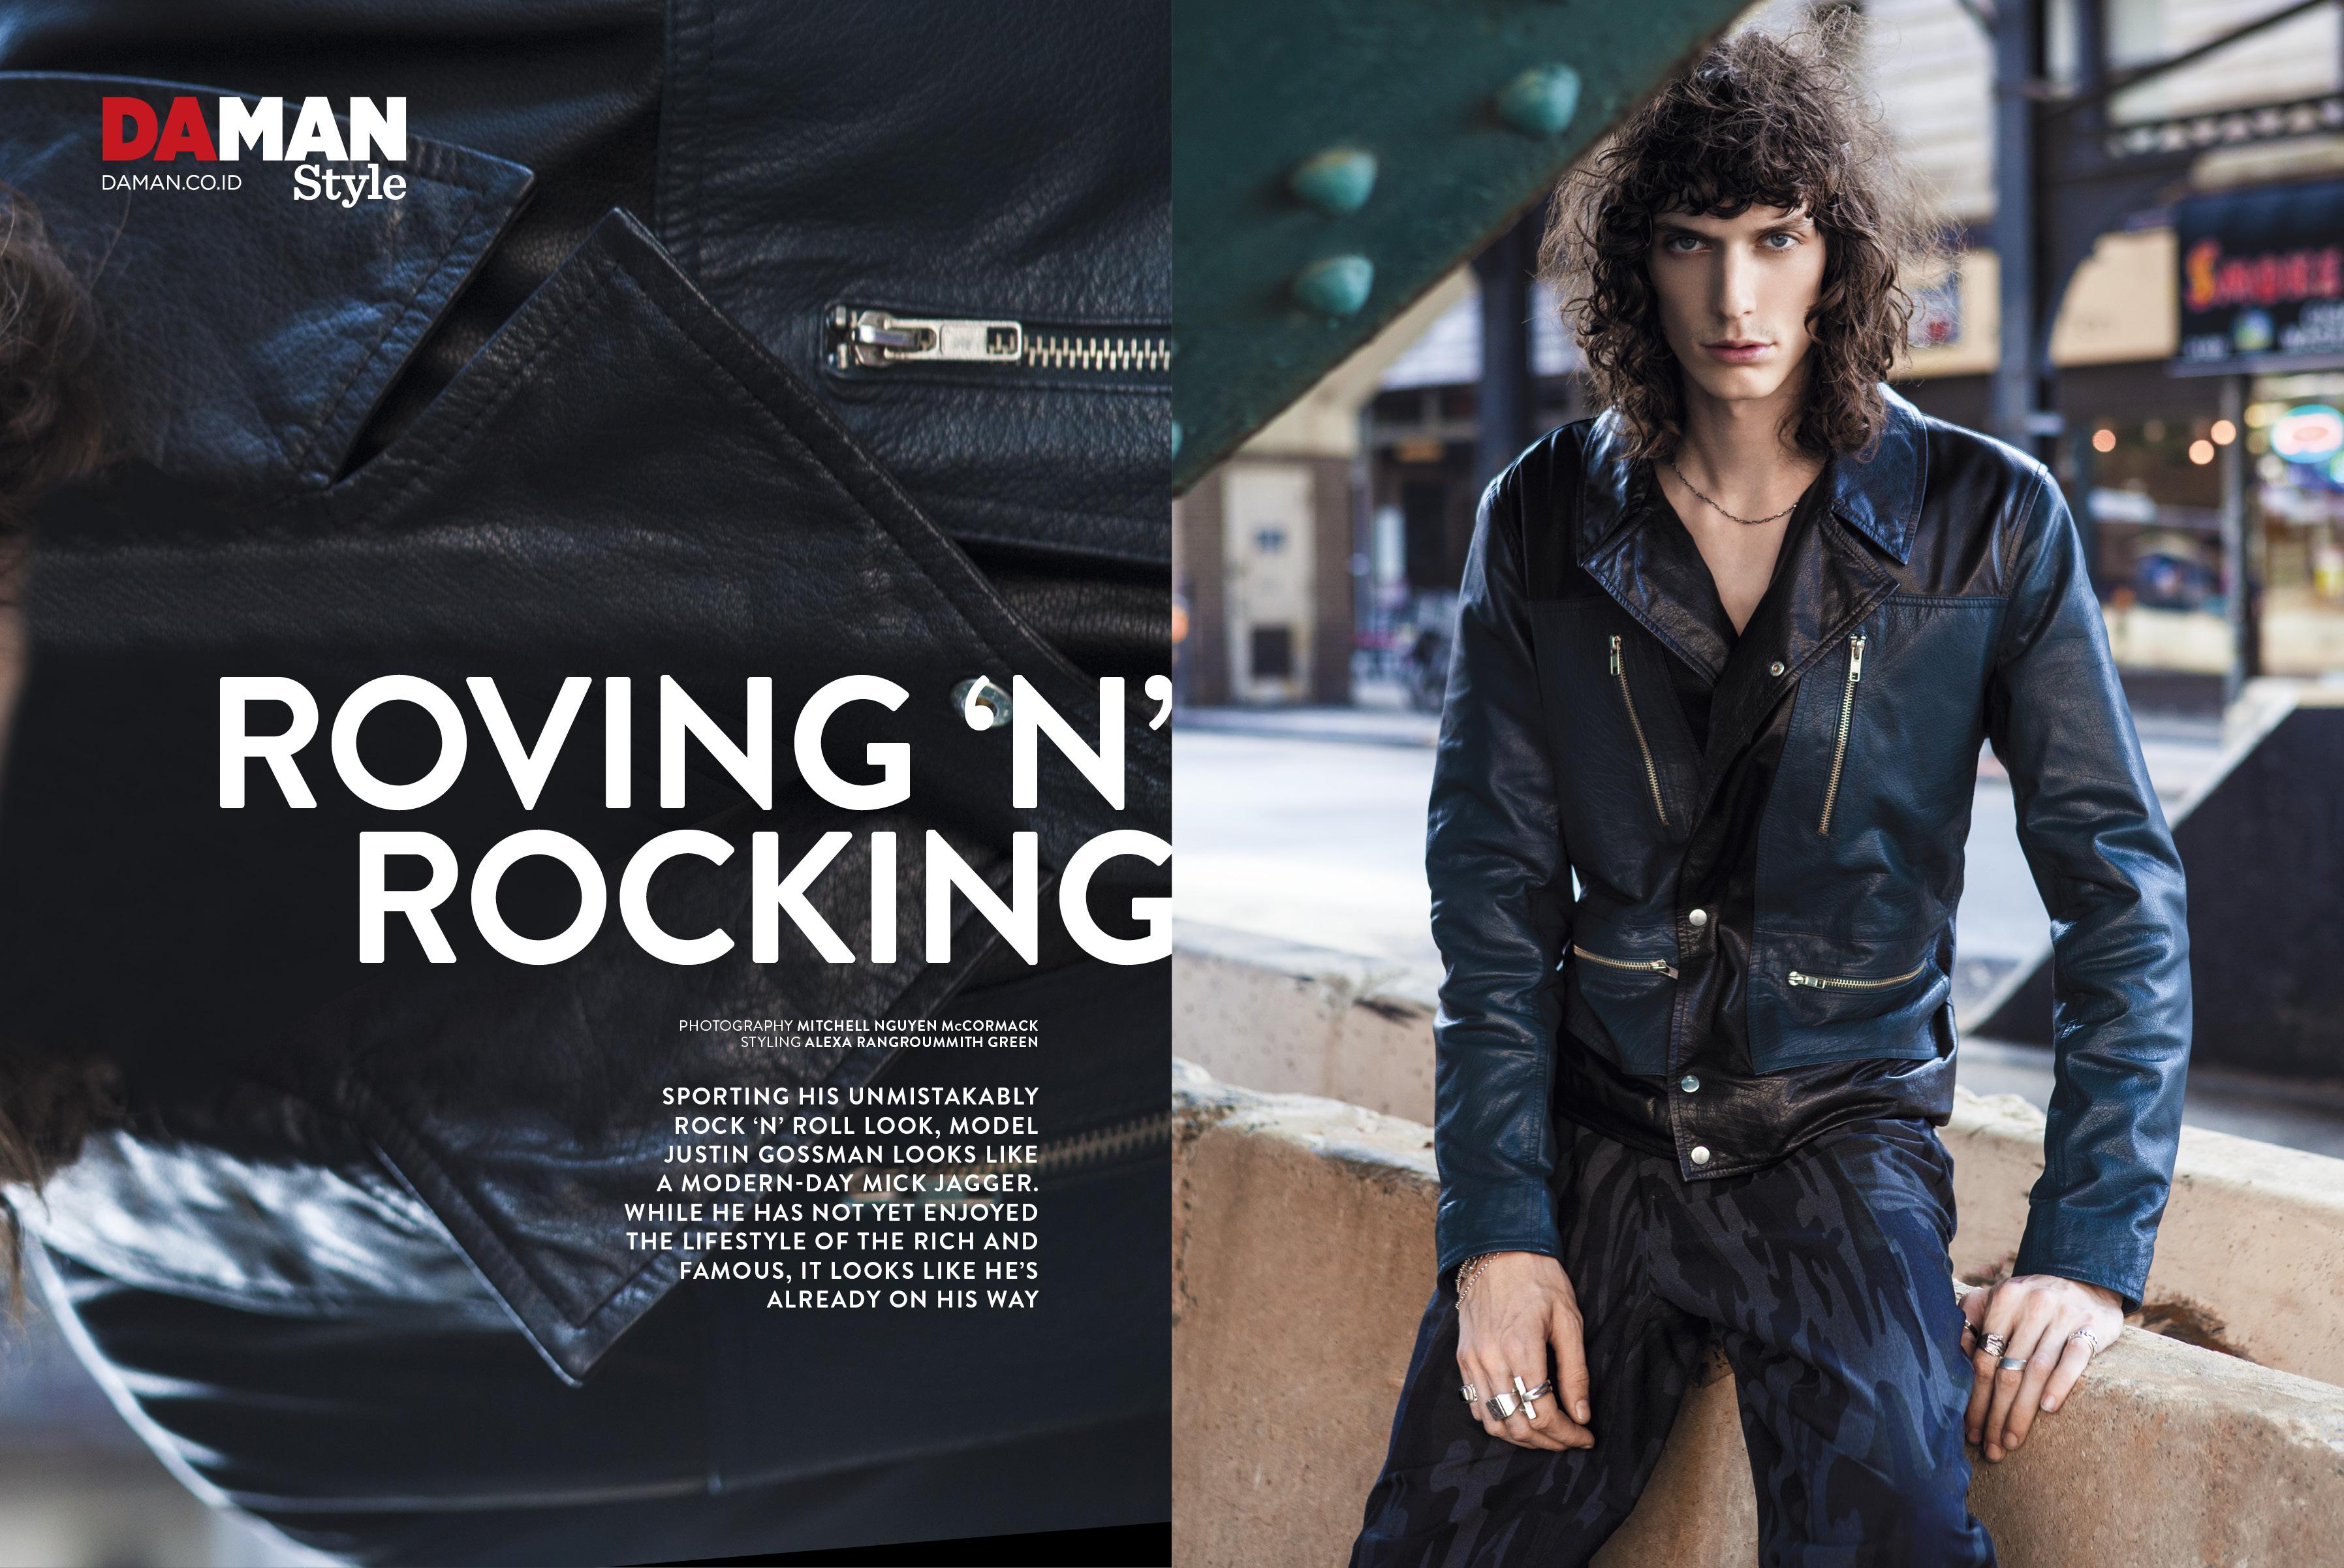 Fashion Spread: Roving N' Rocking